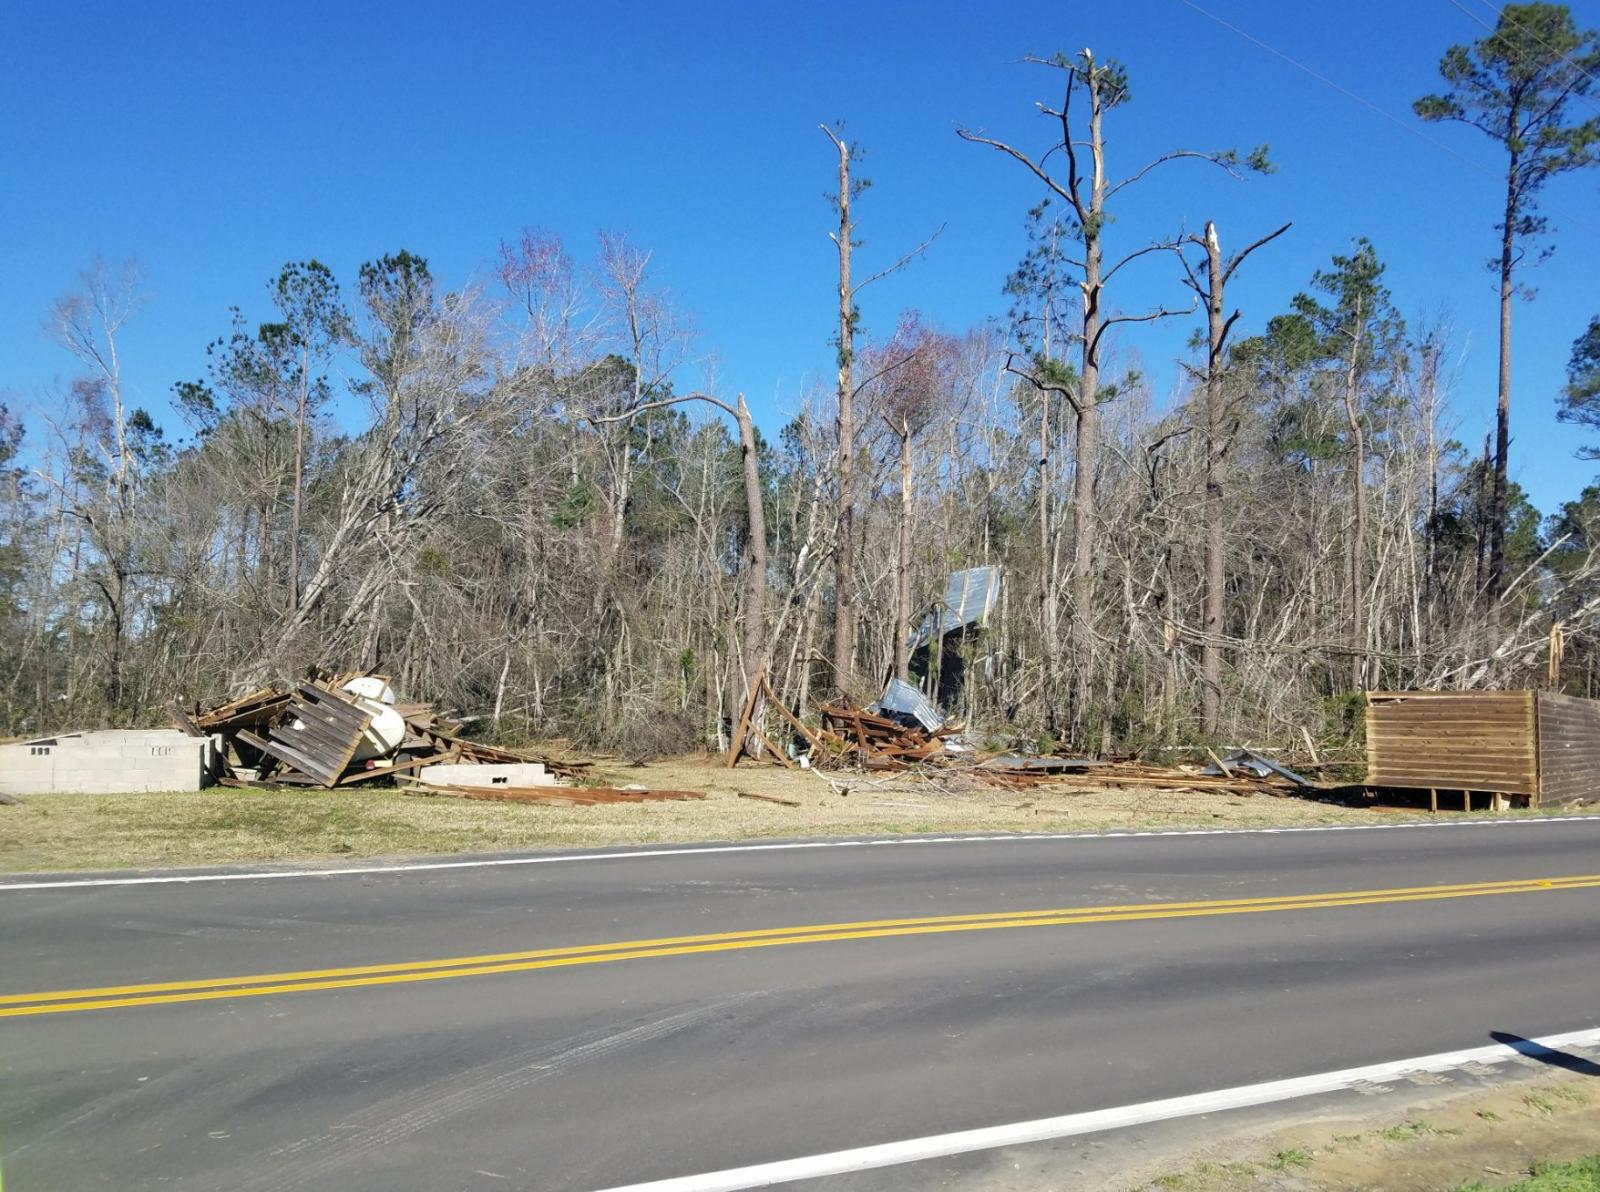 Climate Summary for 2017 across Southeastern North Carolina